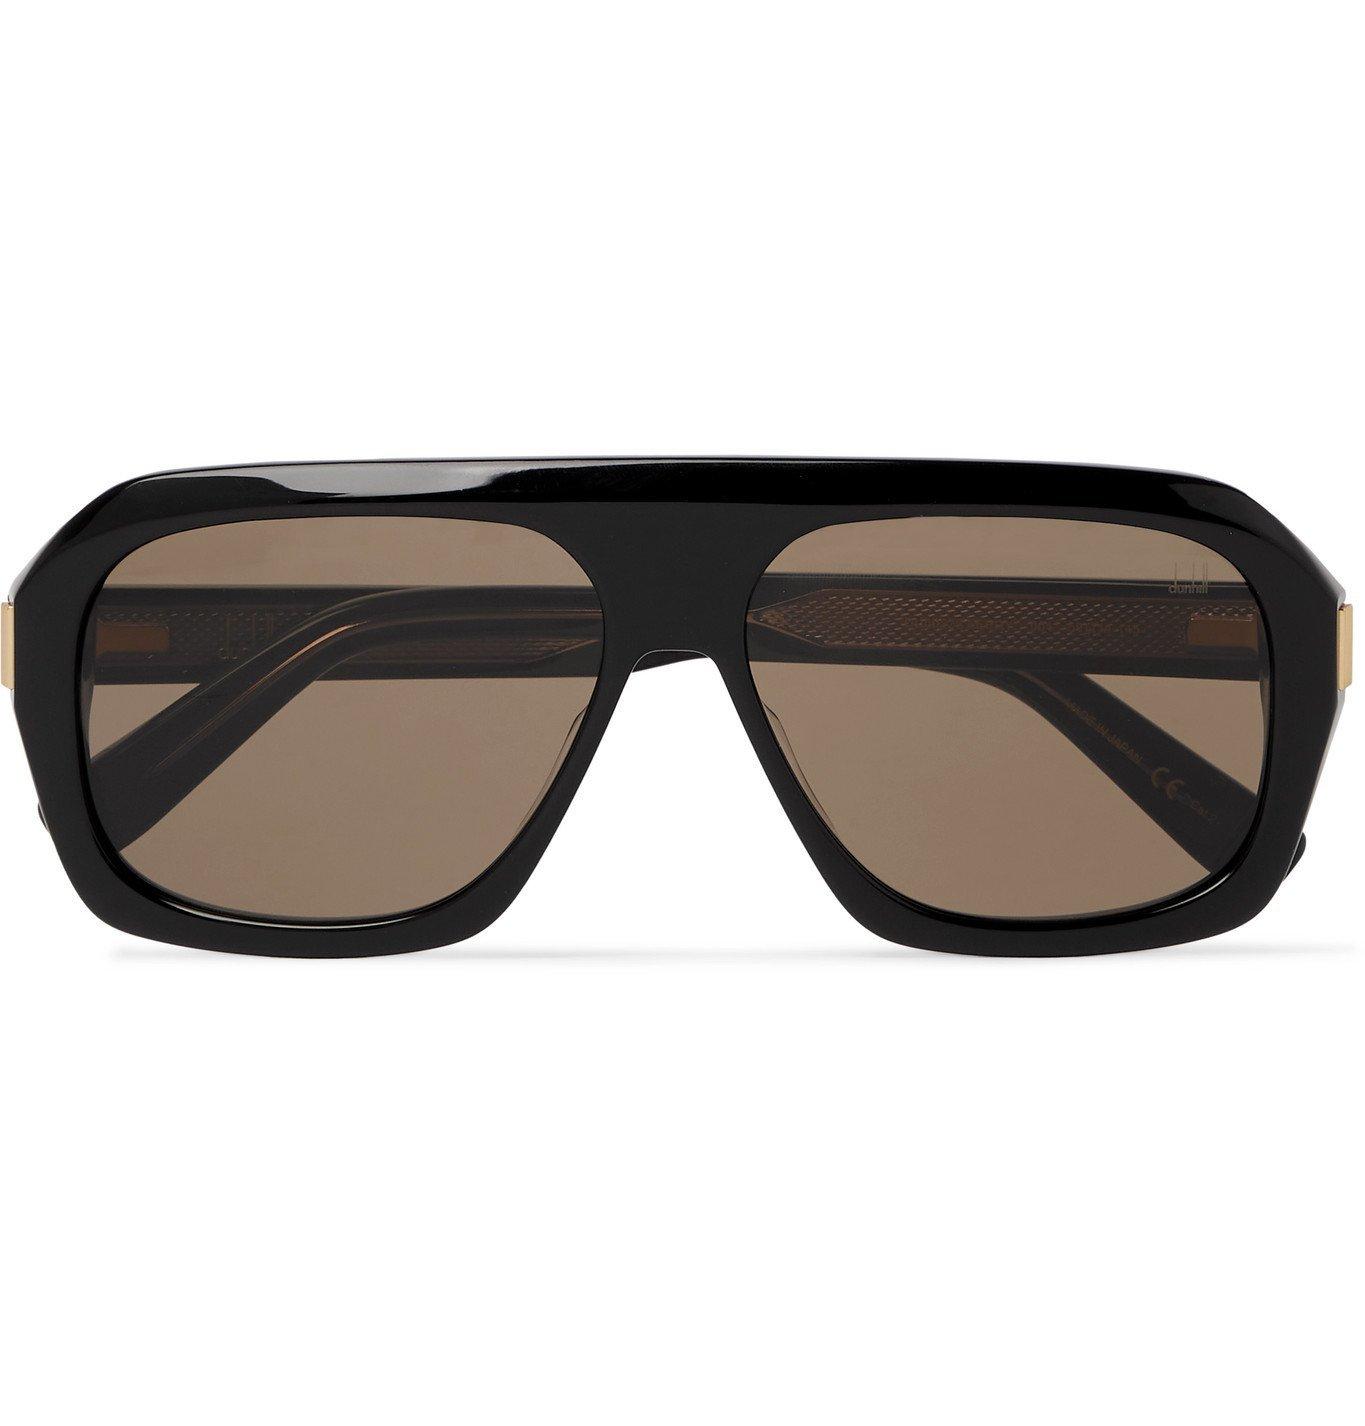 DUNHILL - D-Frame Acetate Sunglasses - Black